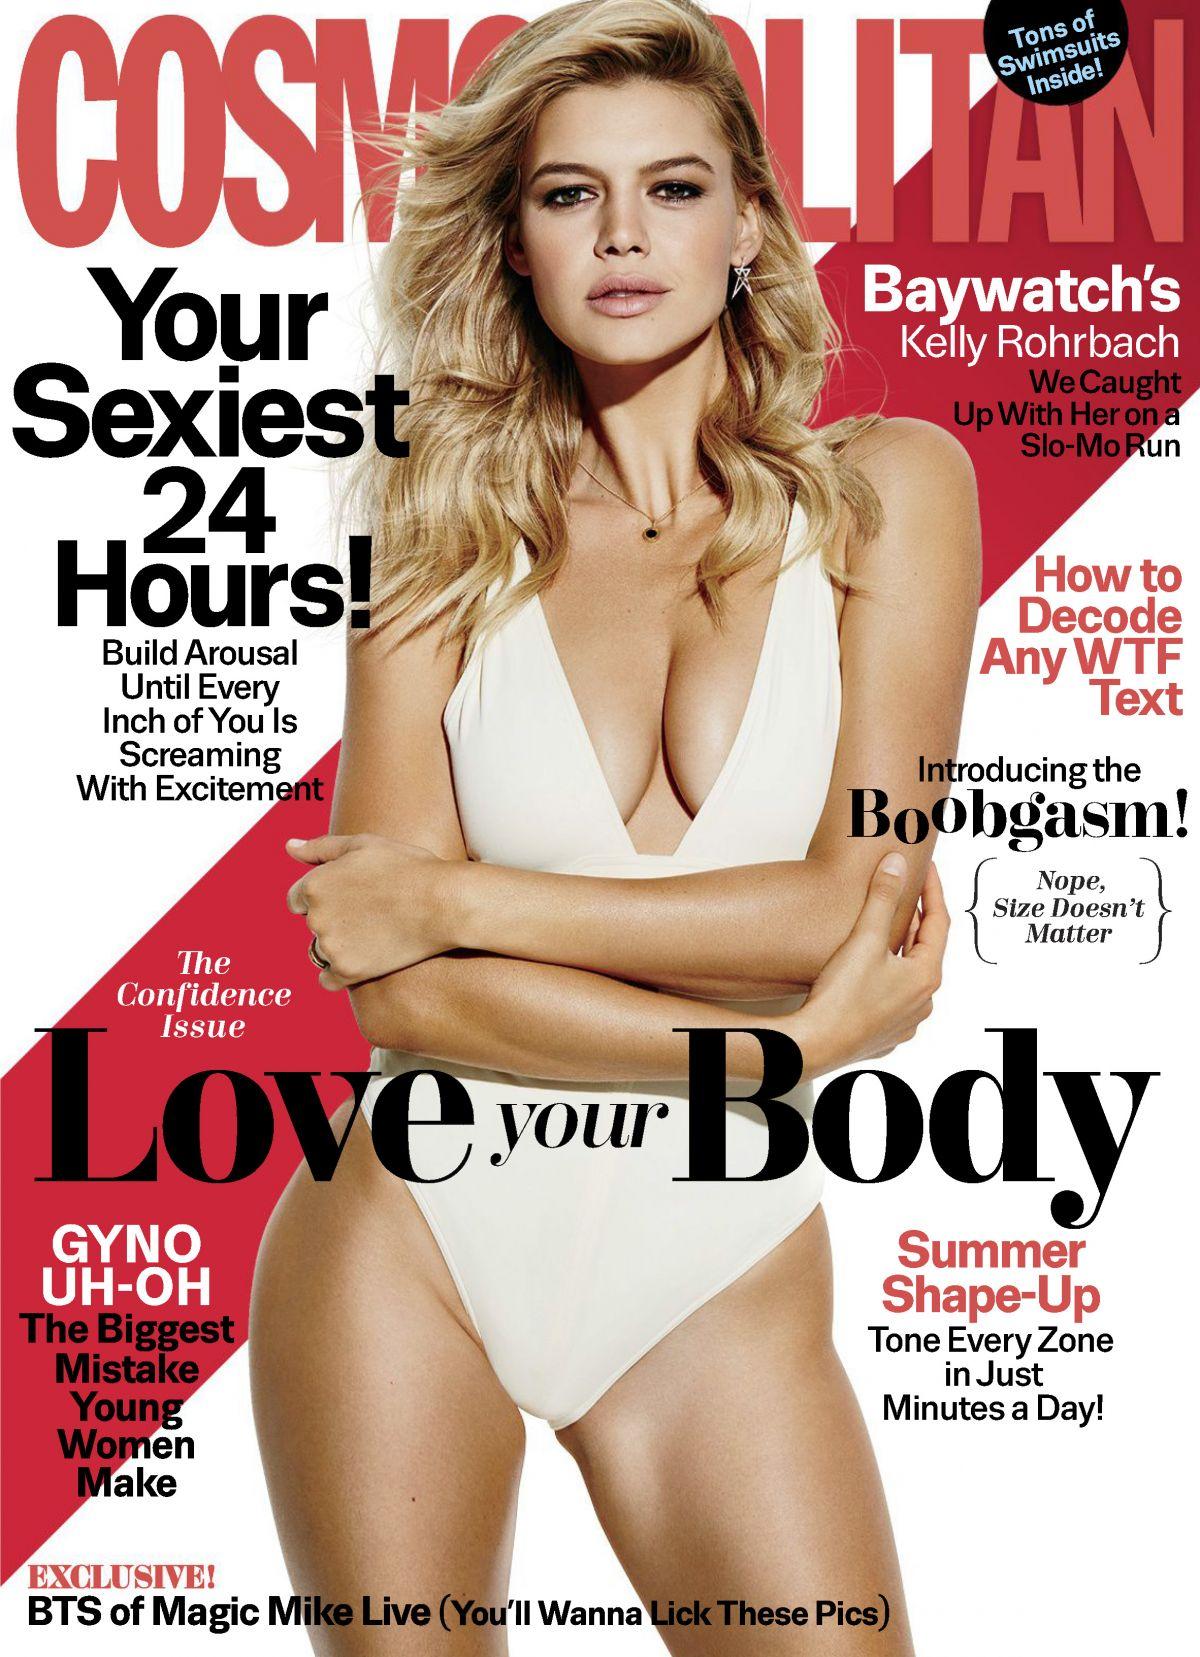 KELLY ROHRBACH in Cosmopolitan Magazine, June 2017 Issue